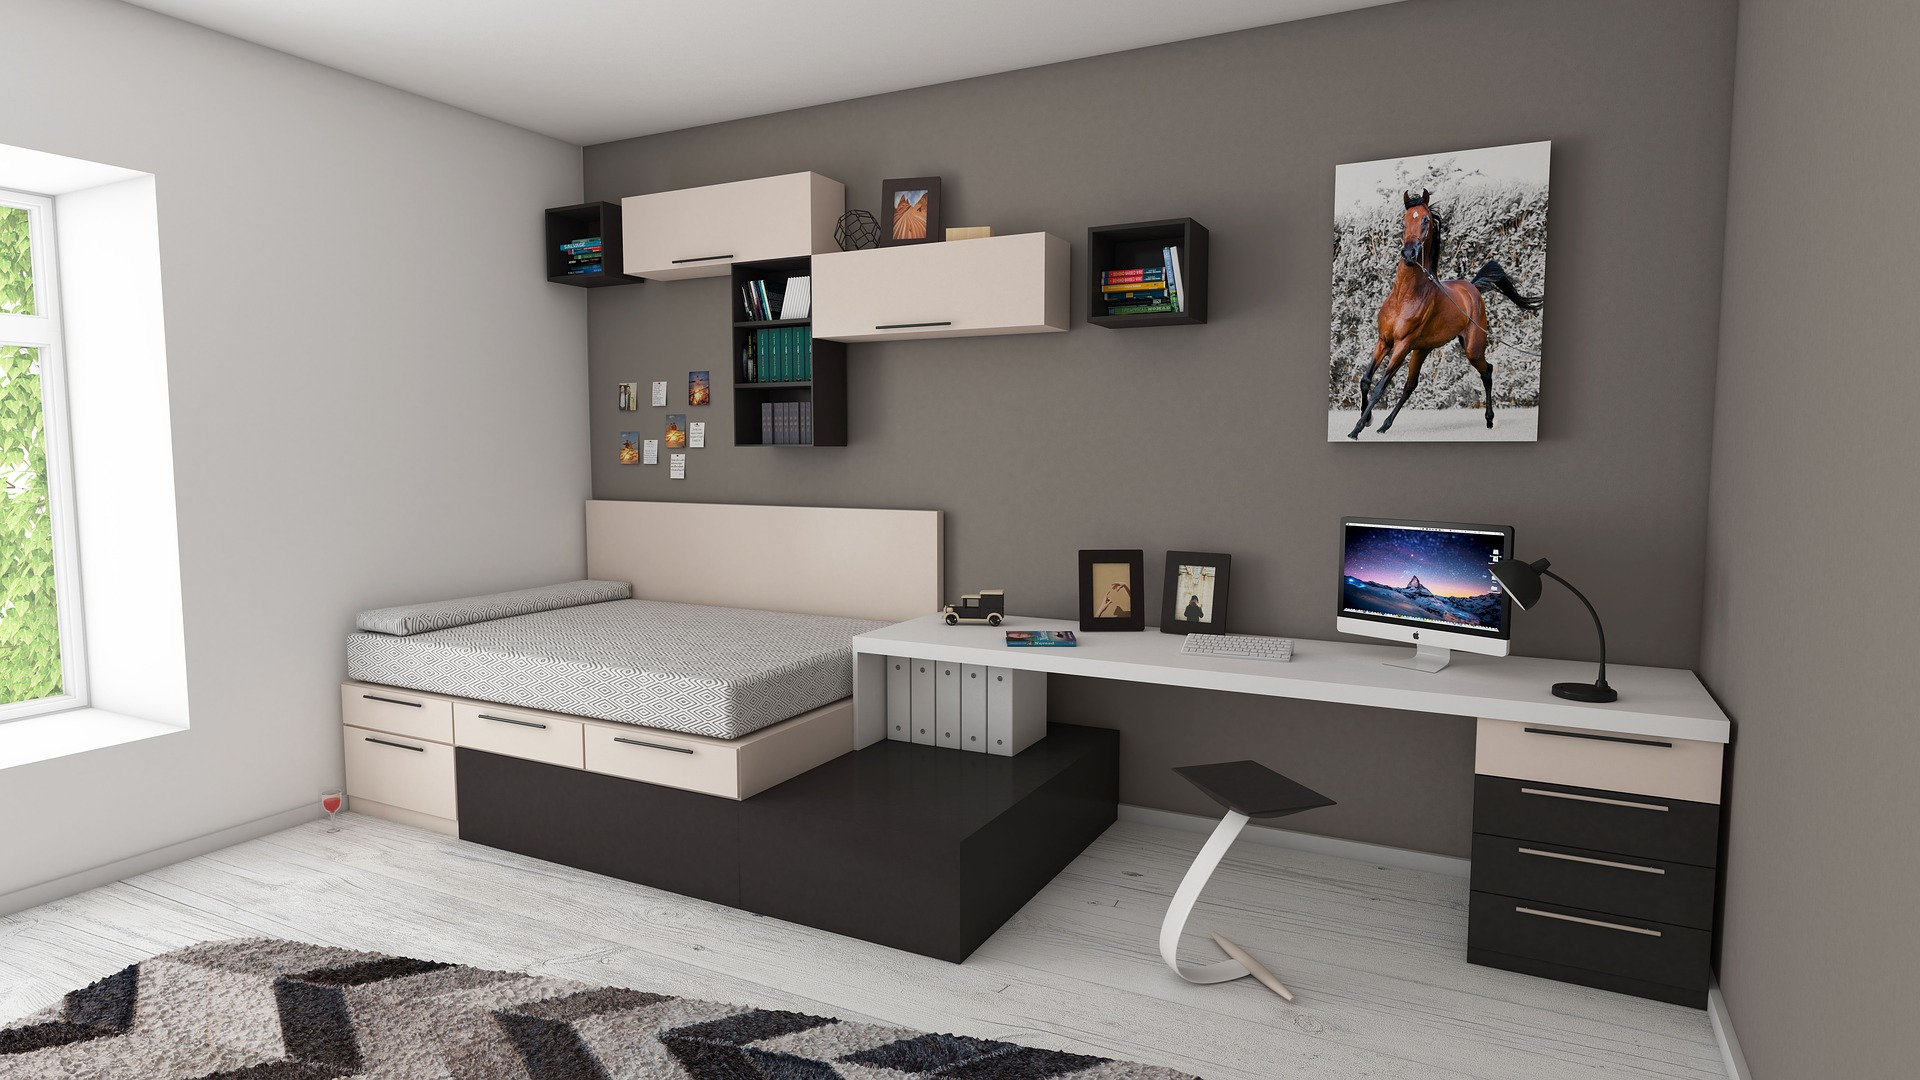 - Apartment Decorating Ideas Ellicott Development